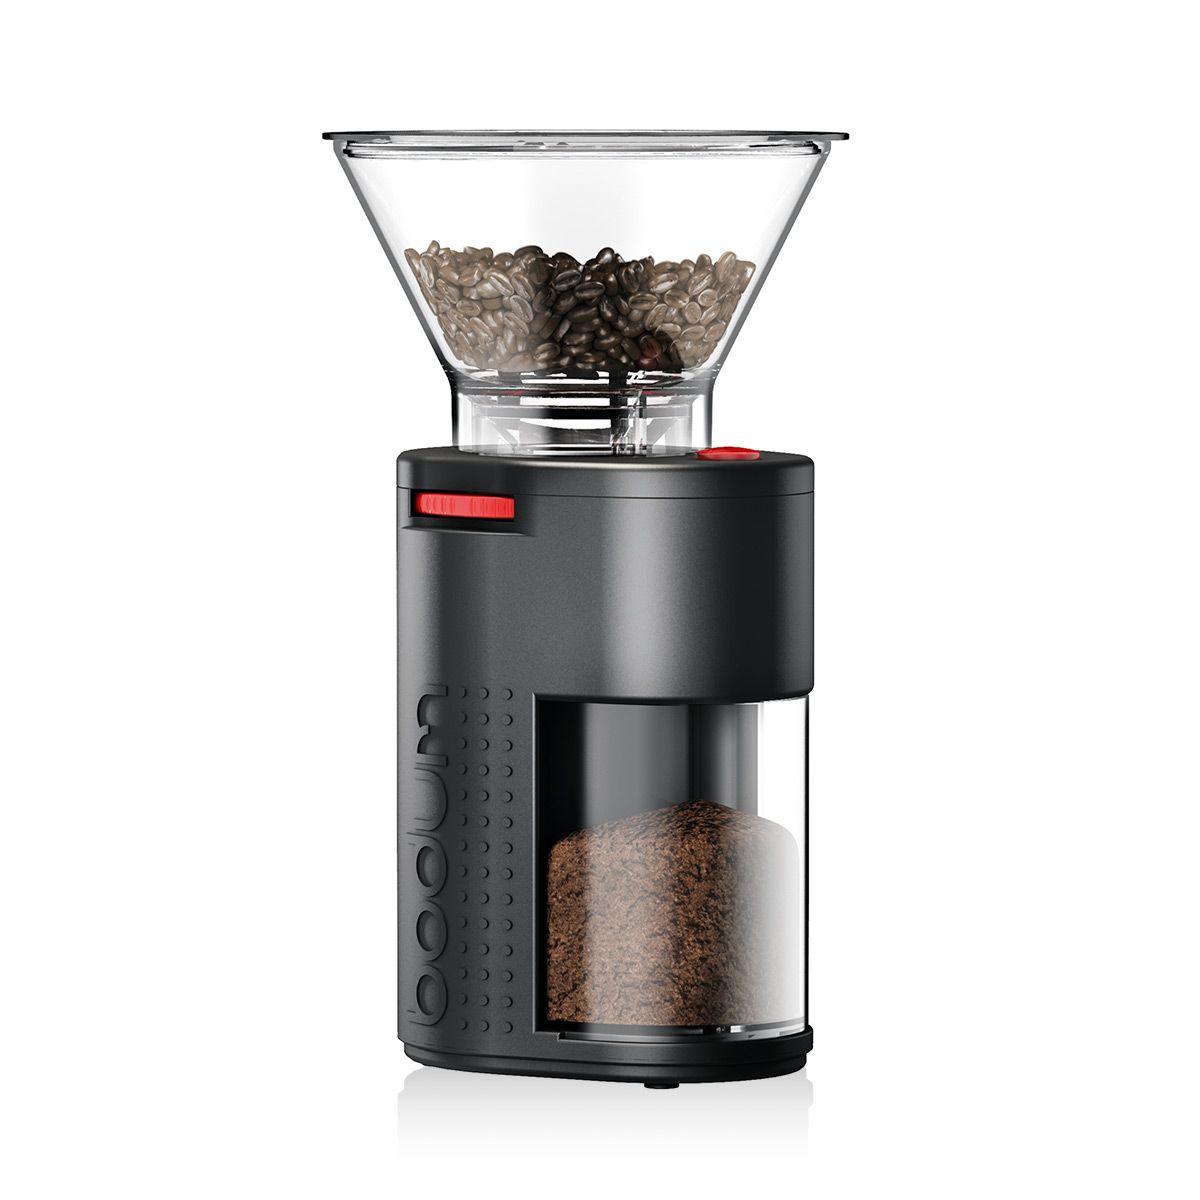 BODUM BISTRO Electric coffee grinder - £44.95 delivered using code @ Bodum Shop